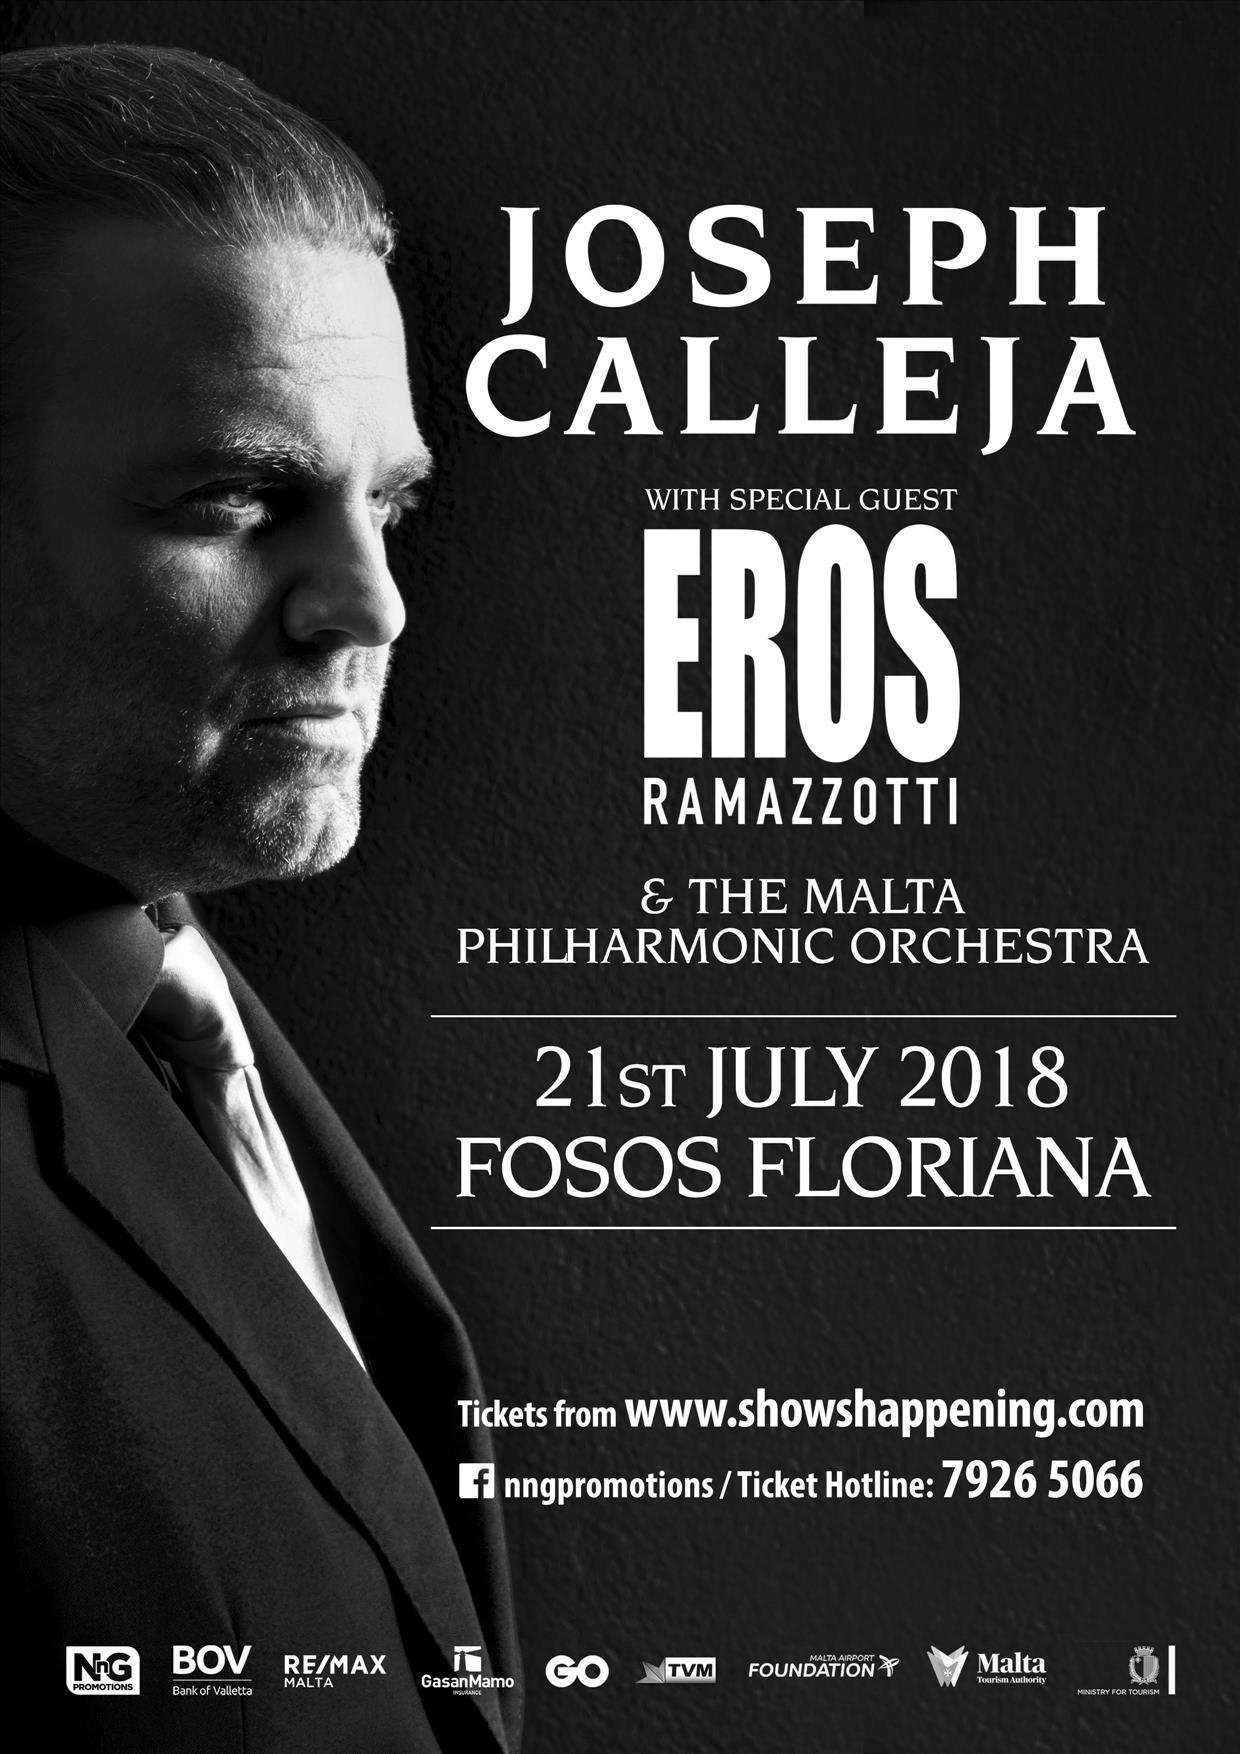 Joseph Calleja 2018 flyer